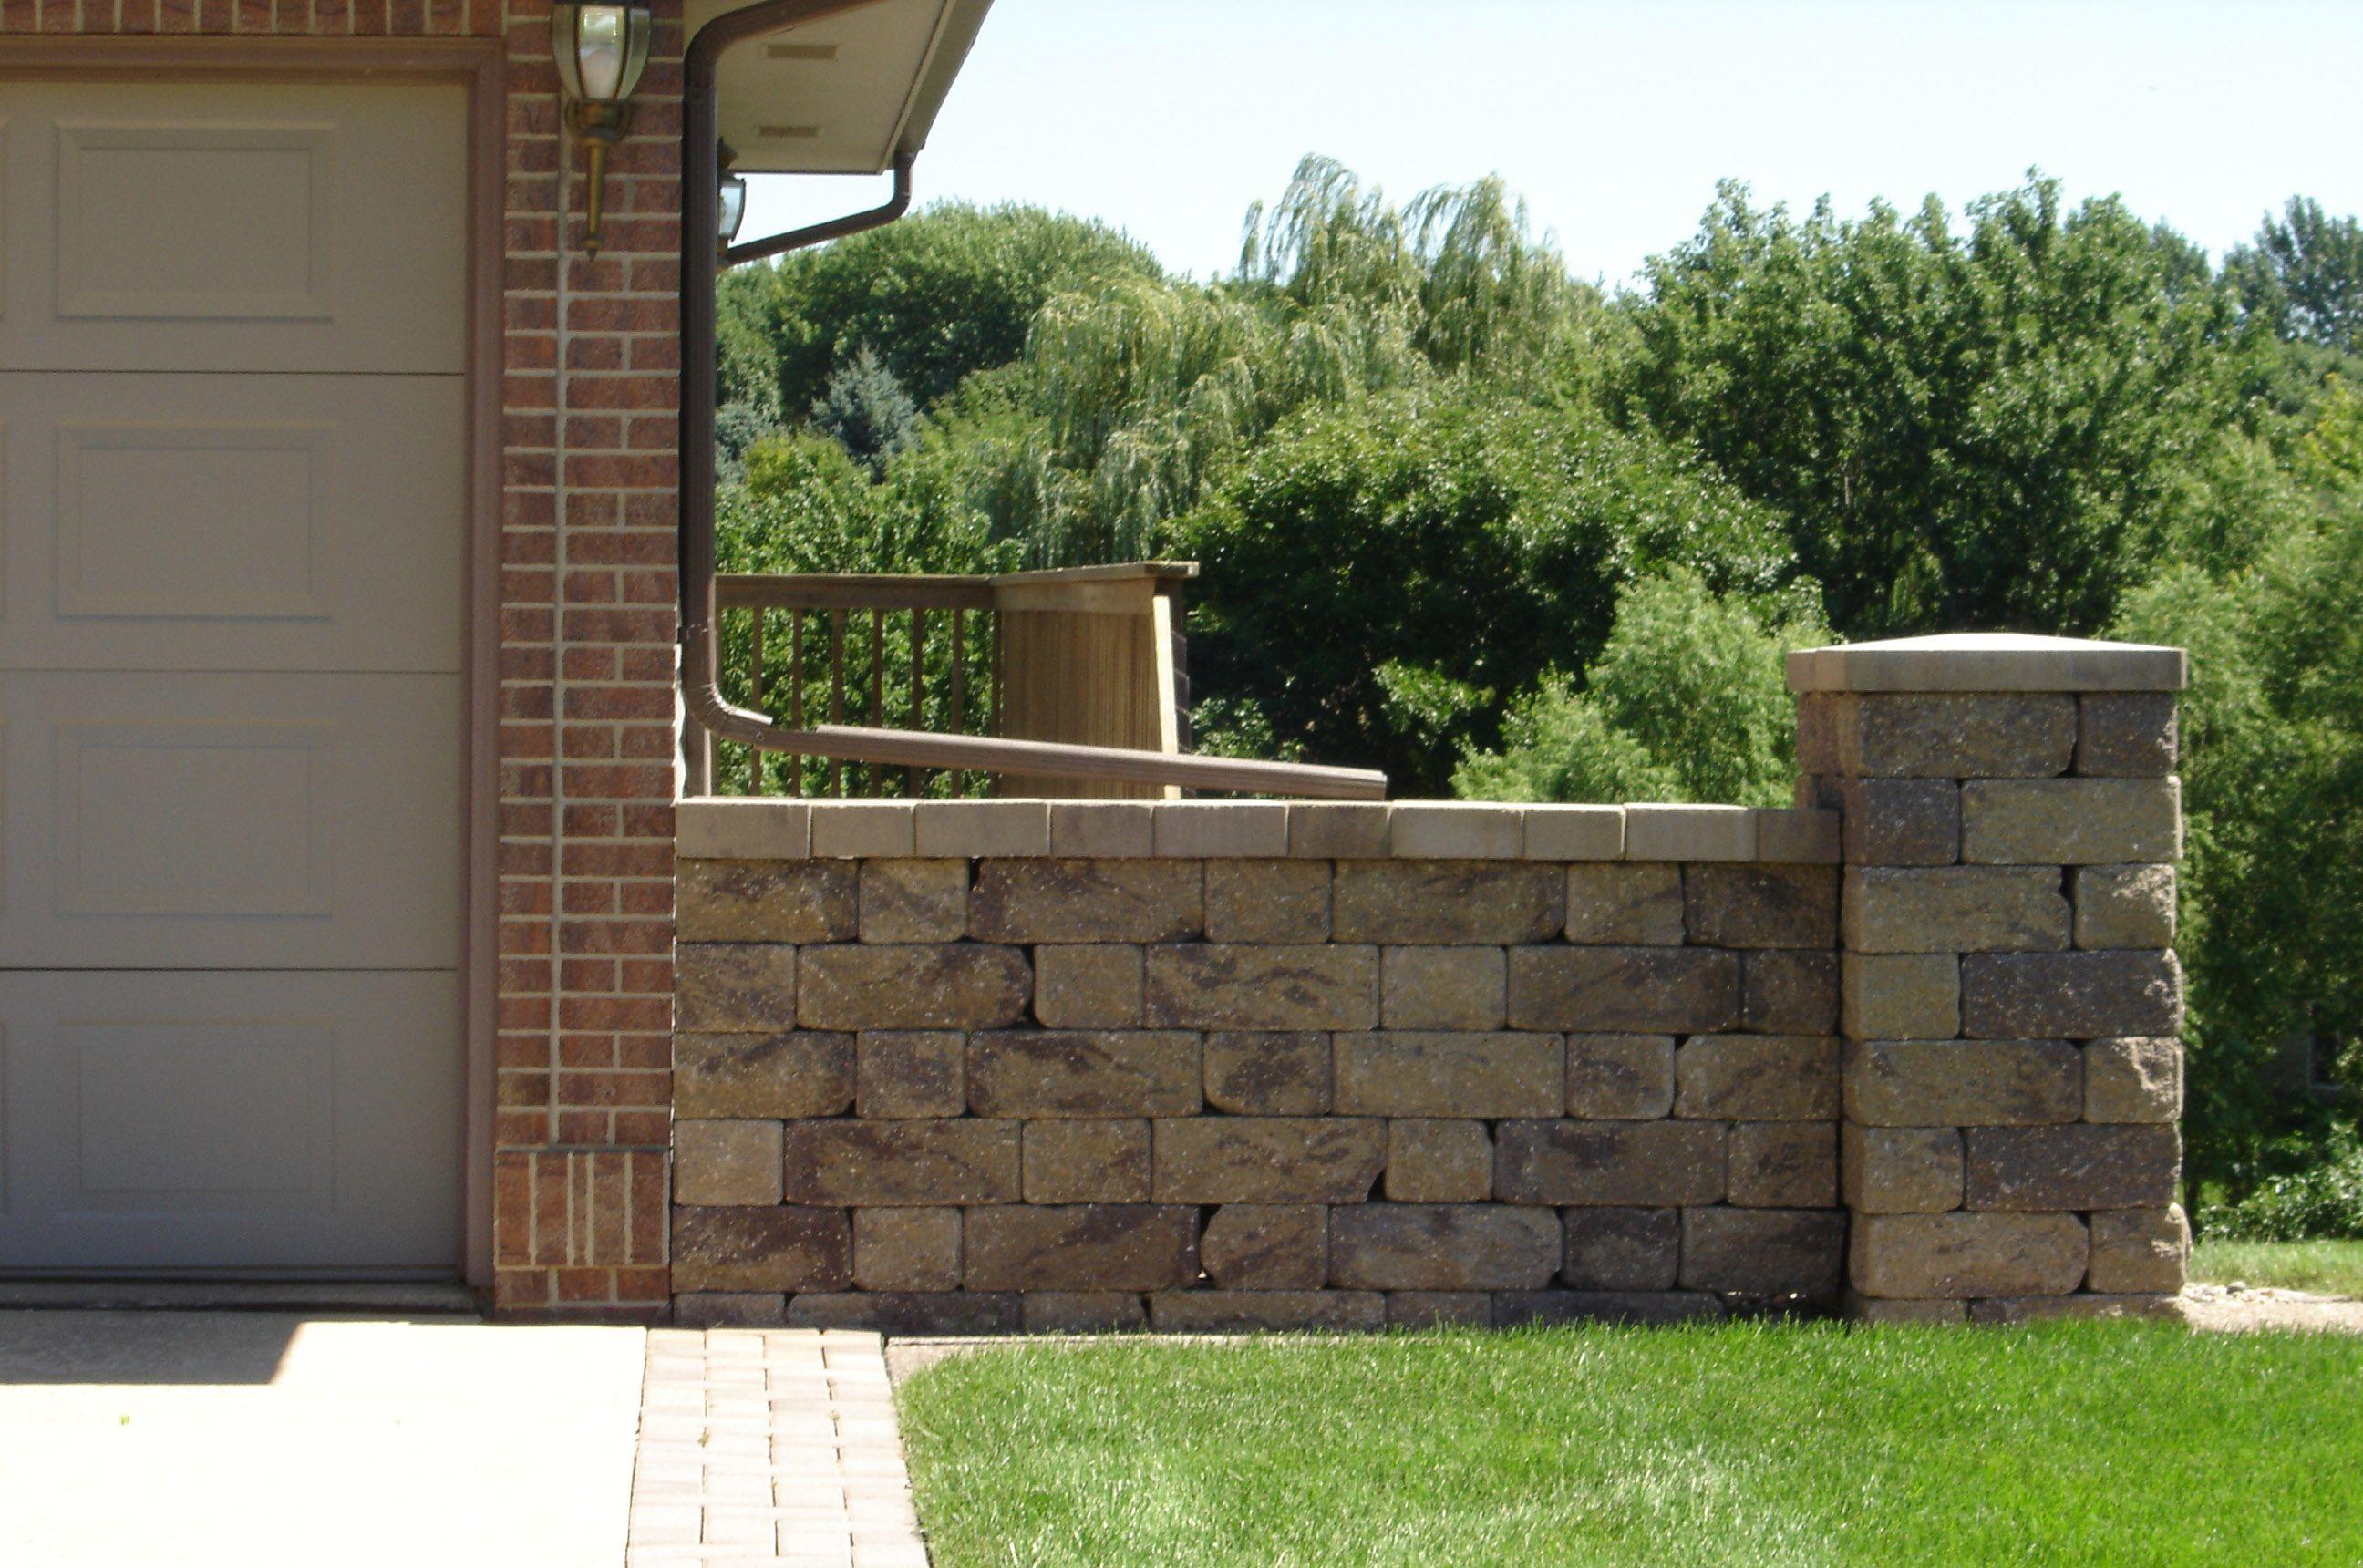 Retaining wall interlocking blocks block walls privacy fence rails a 1 fence company anaheim ca